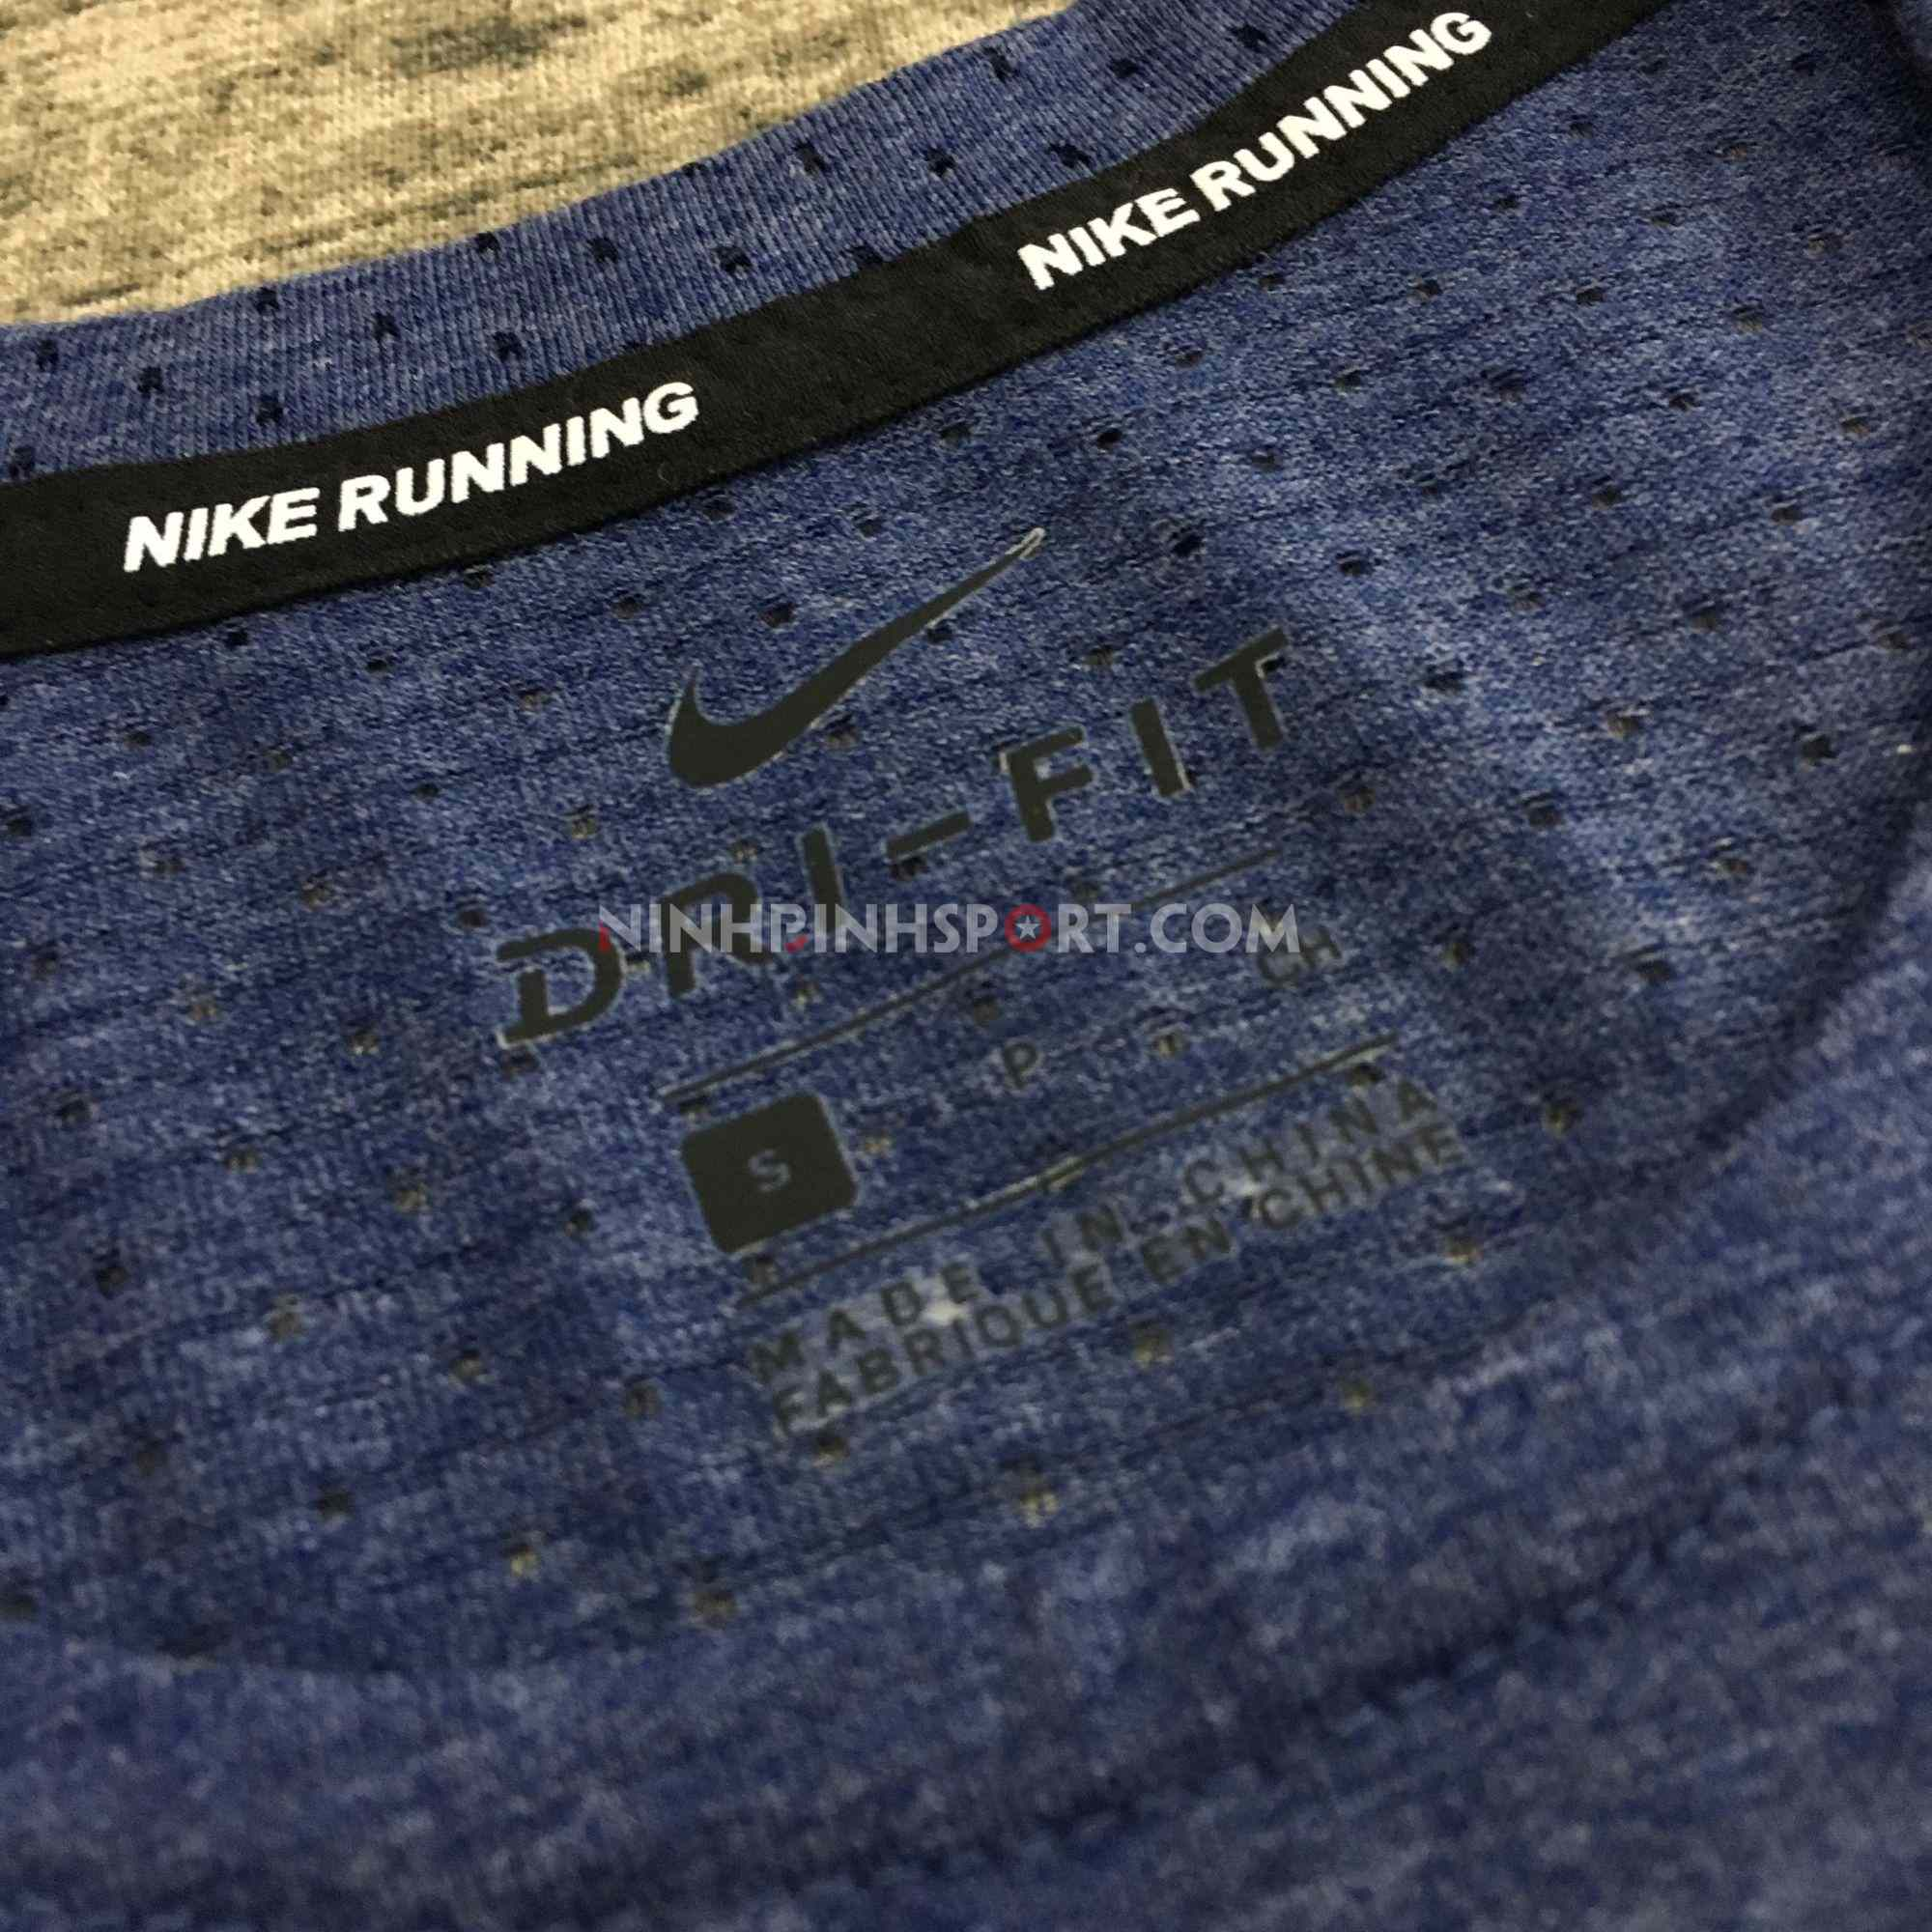 Áo thể thao nam Nike Breathe Rise 365 Blue AQ9920-492